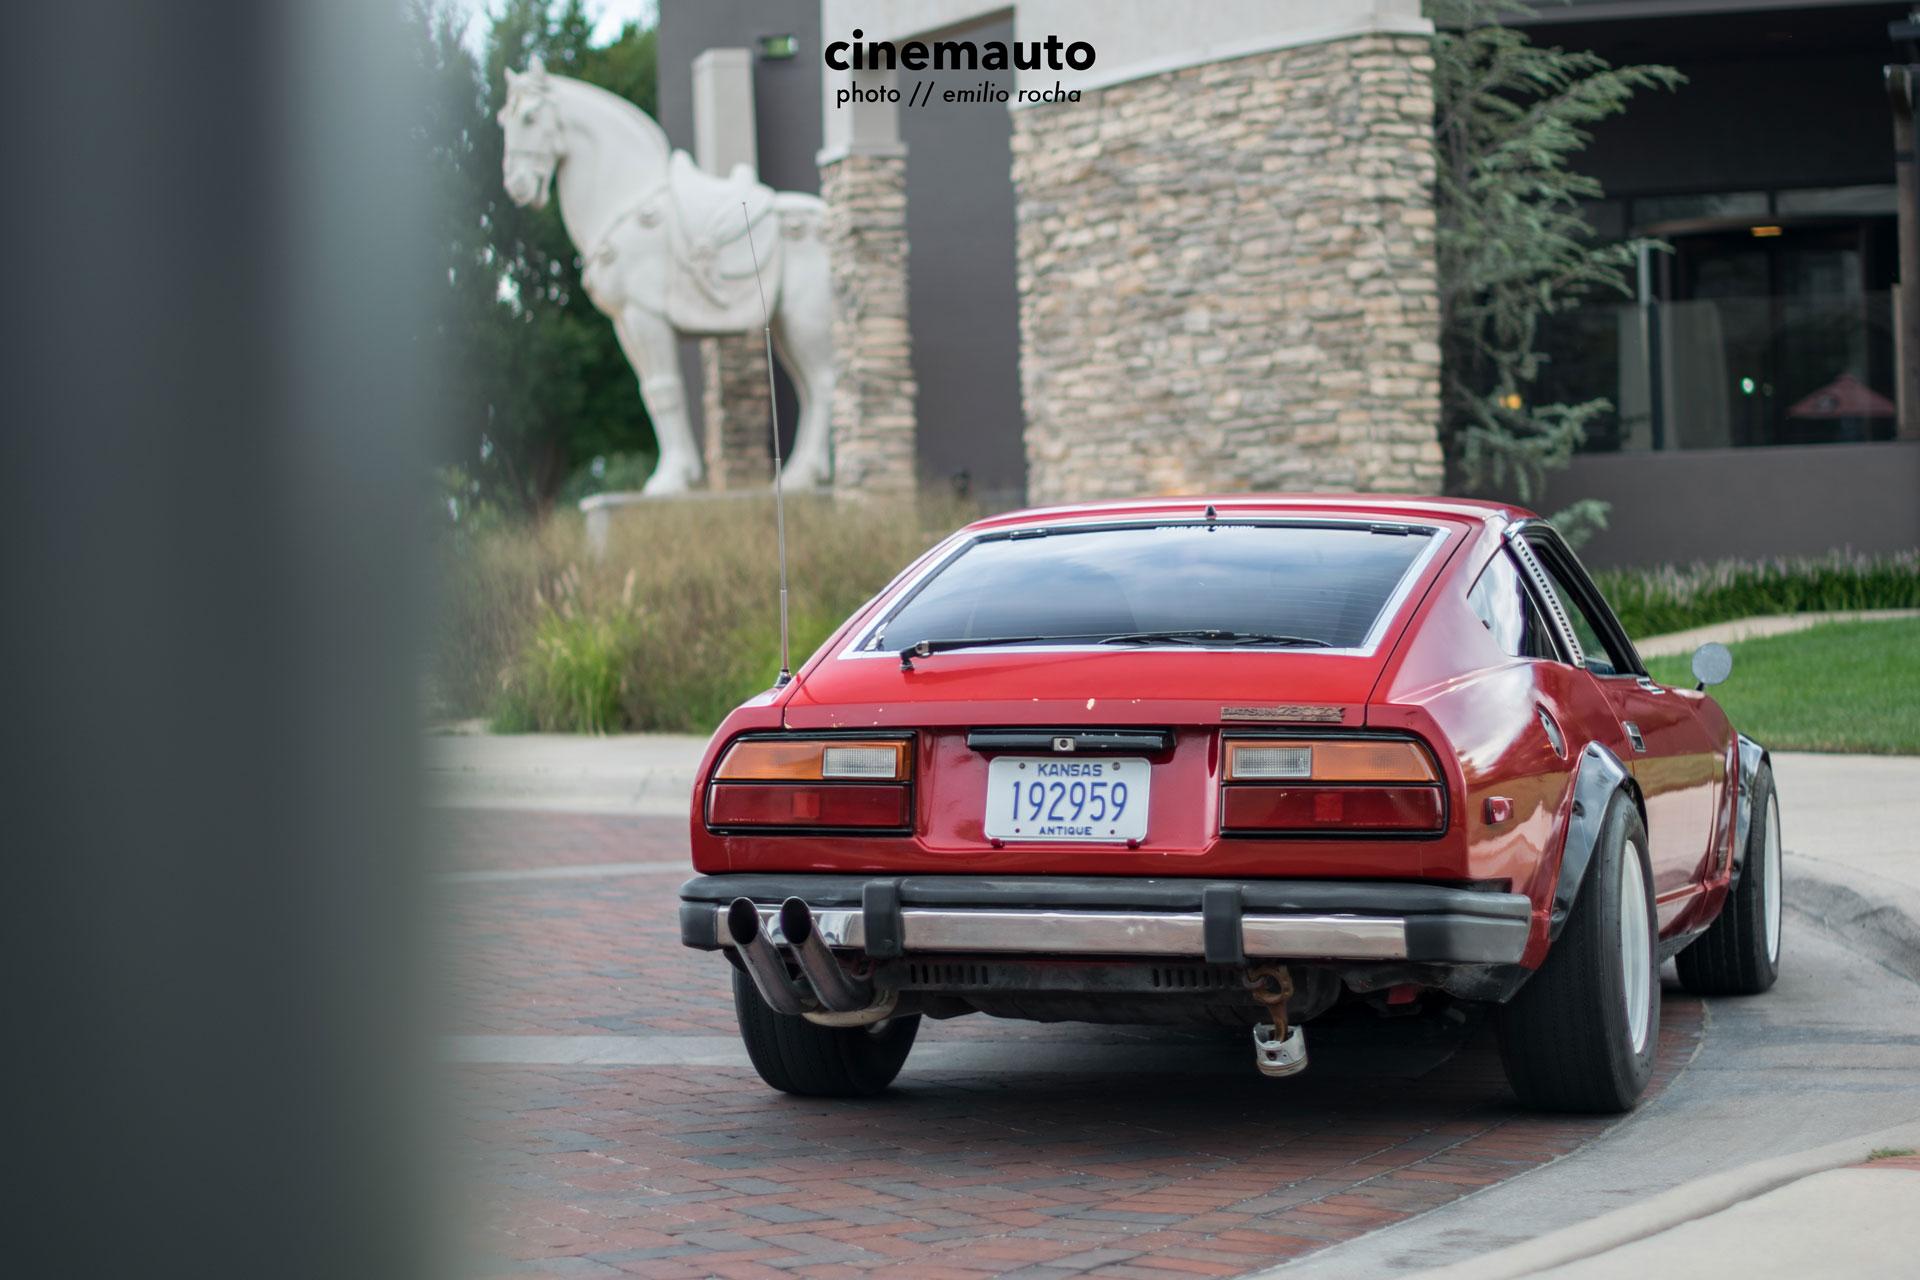 cinemauto-kansas-automotive-photography-datsun17.jpg